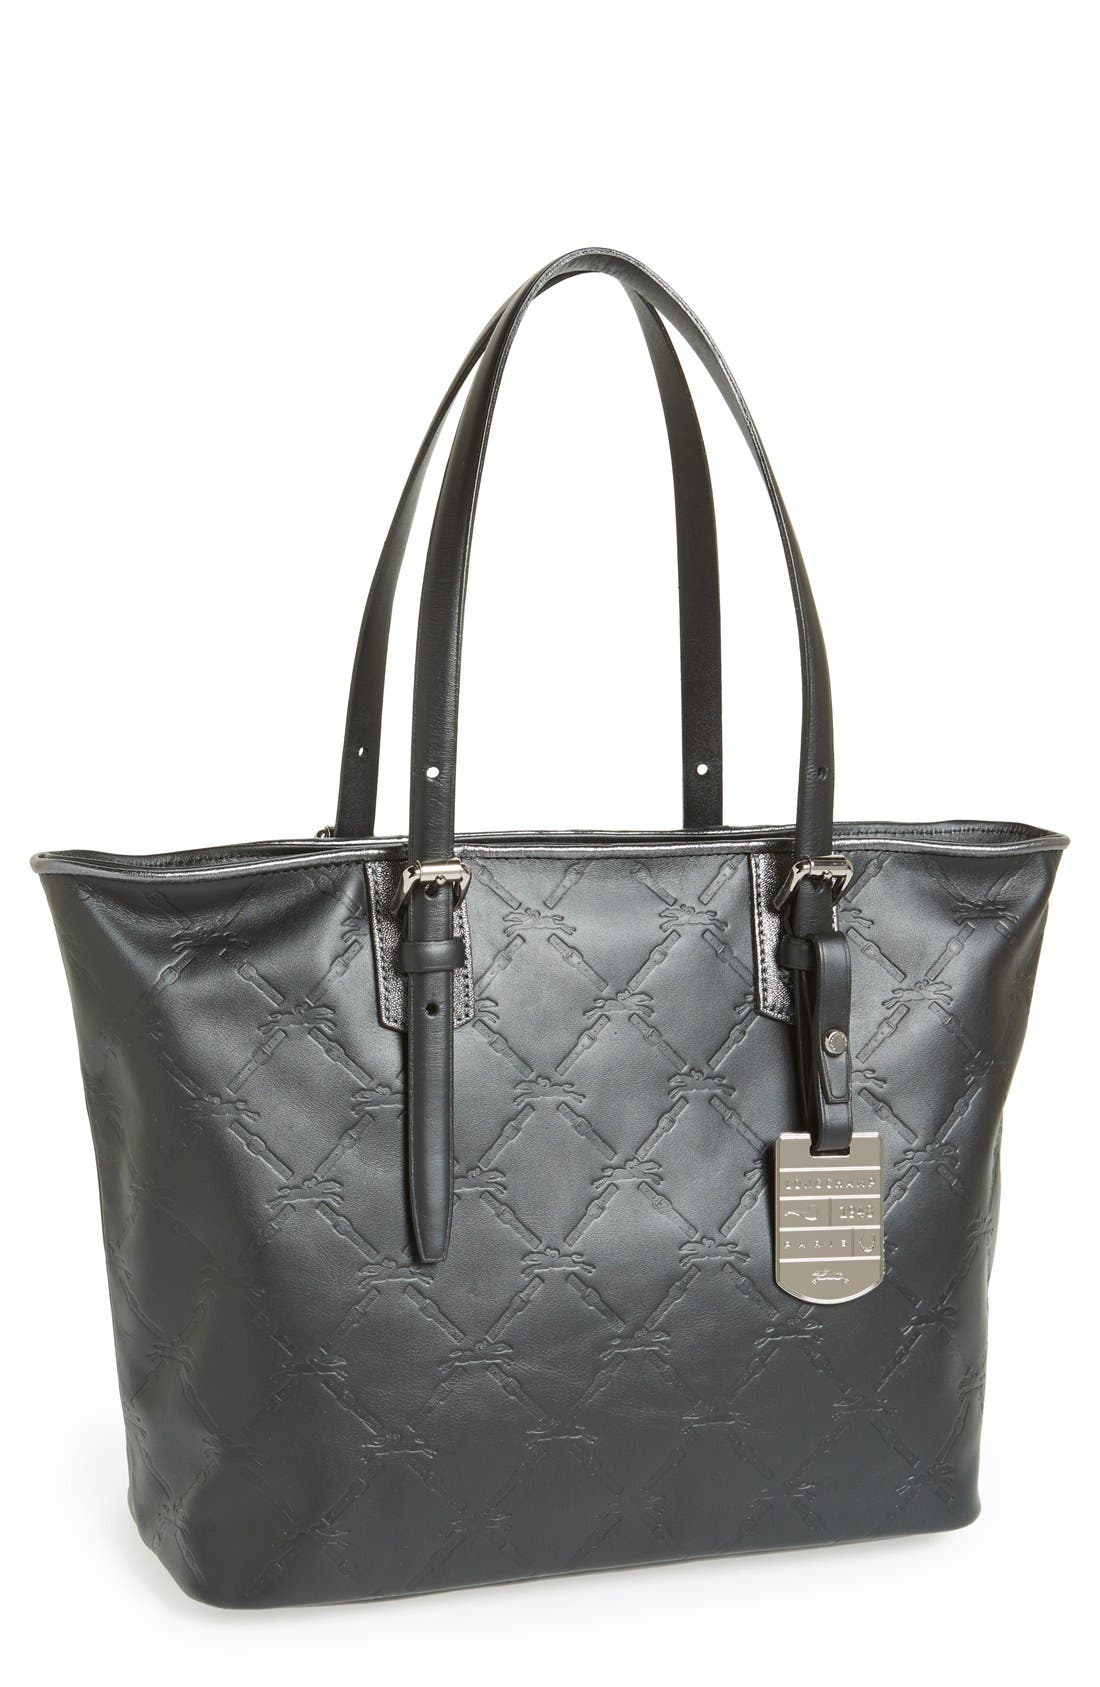 Main Image - Longchamp 'Medium LM Cuir' Leather Tote